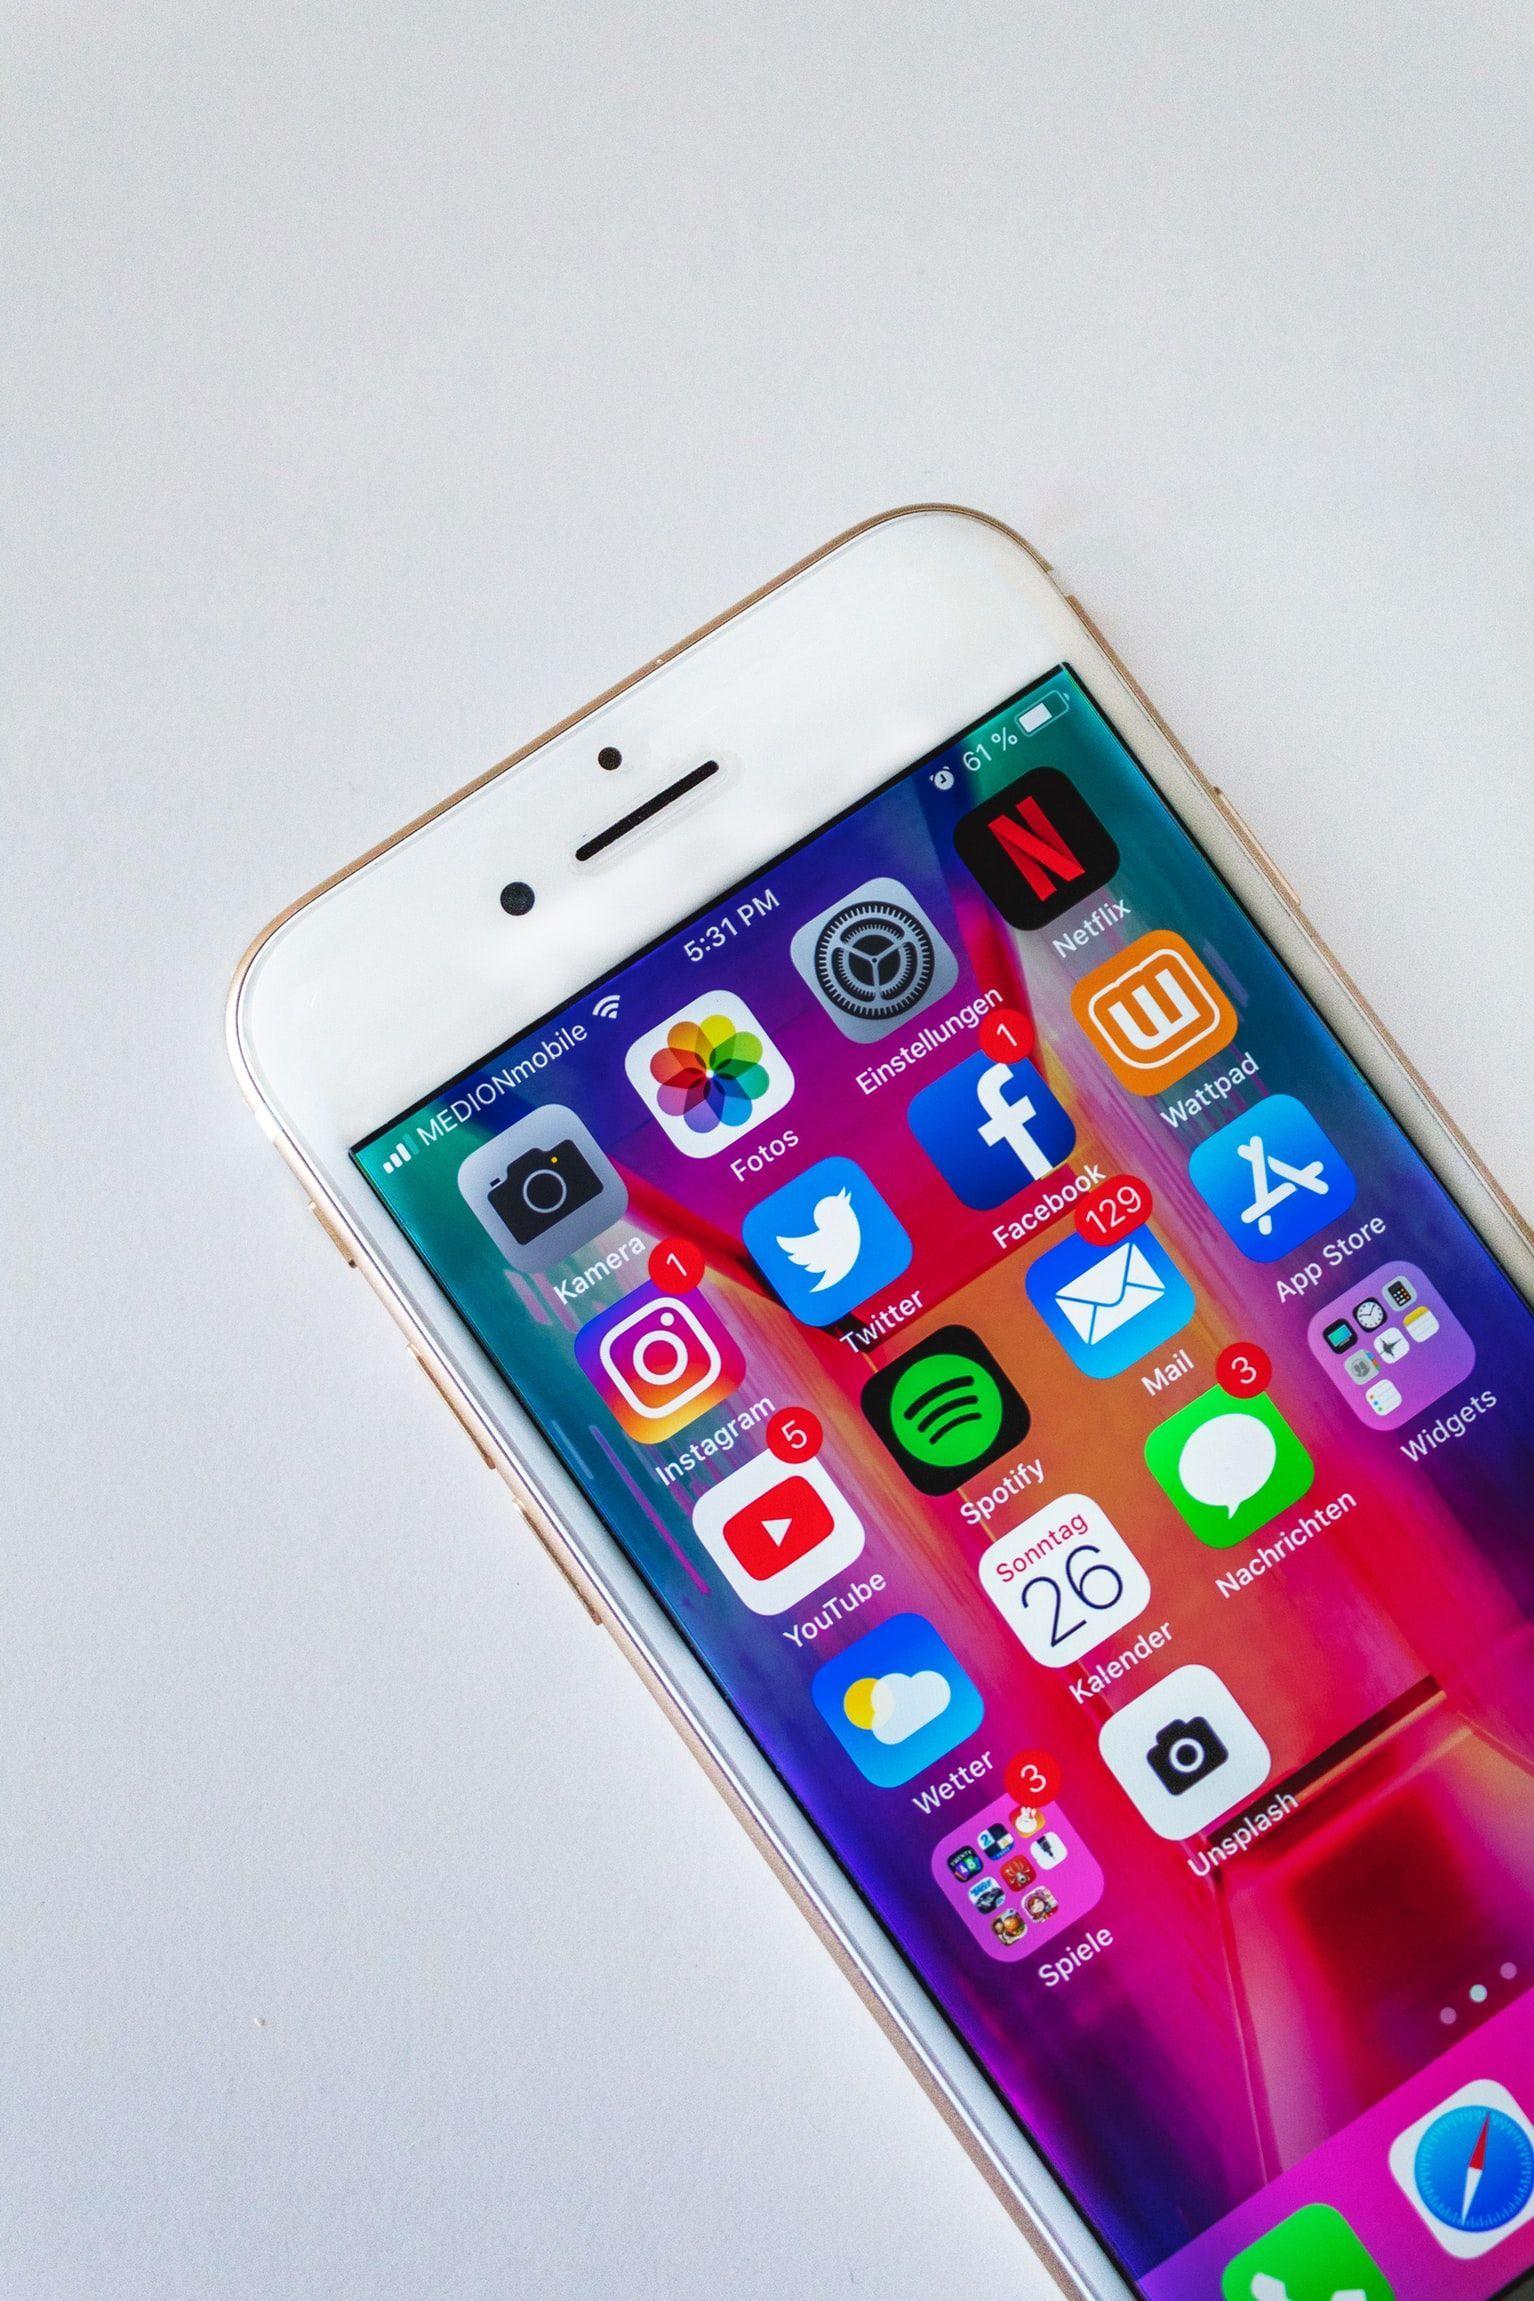 Cek! Ini Daftar Aplikasi yang Bikin 'Kere' Secara Perlahan